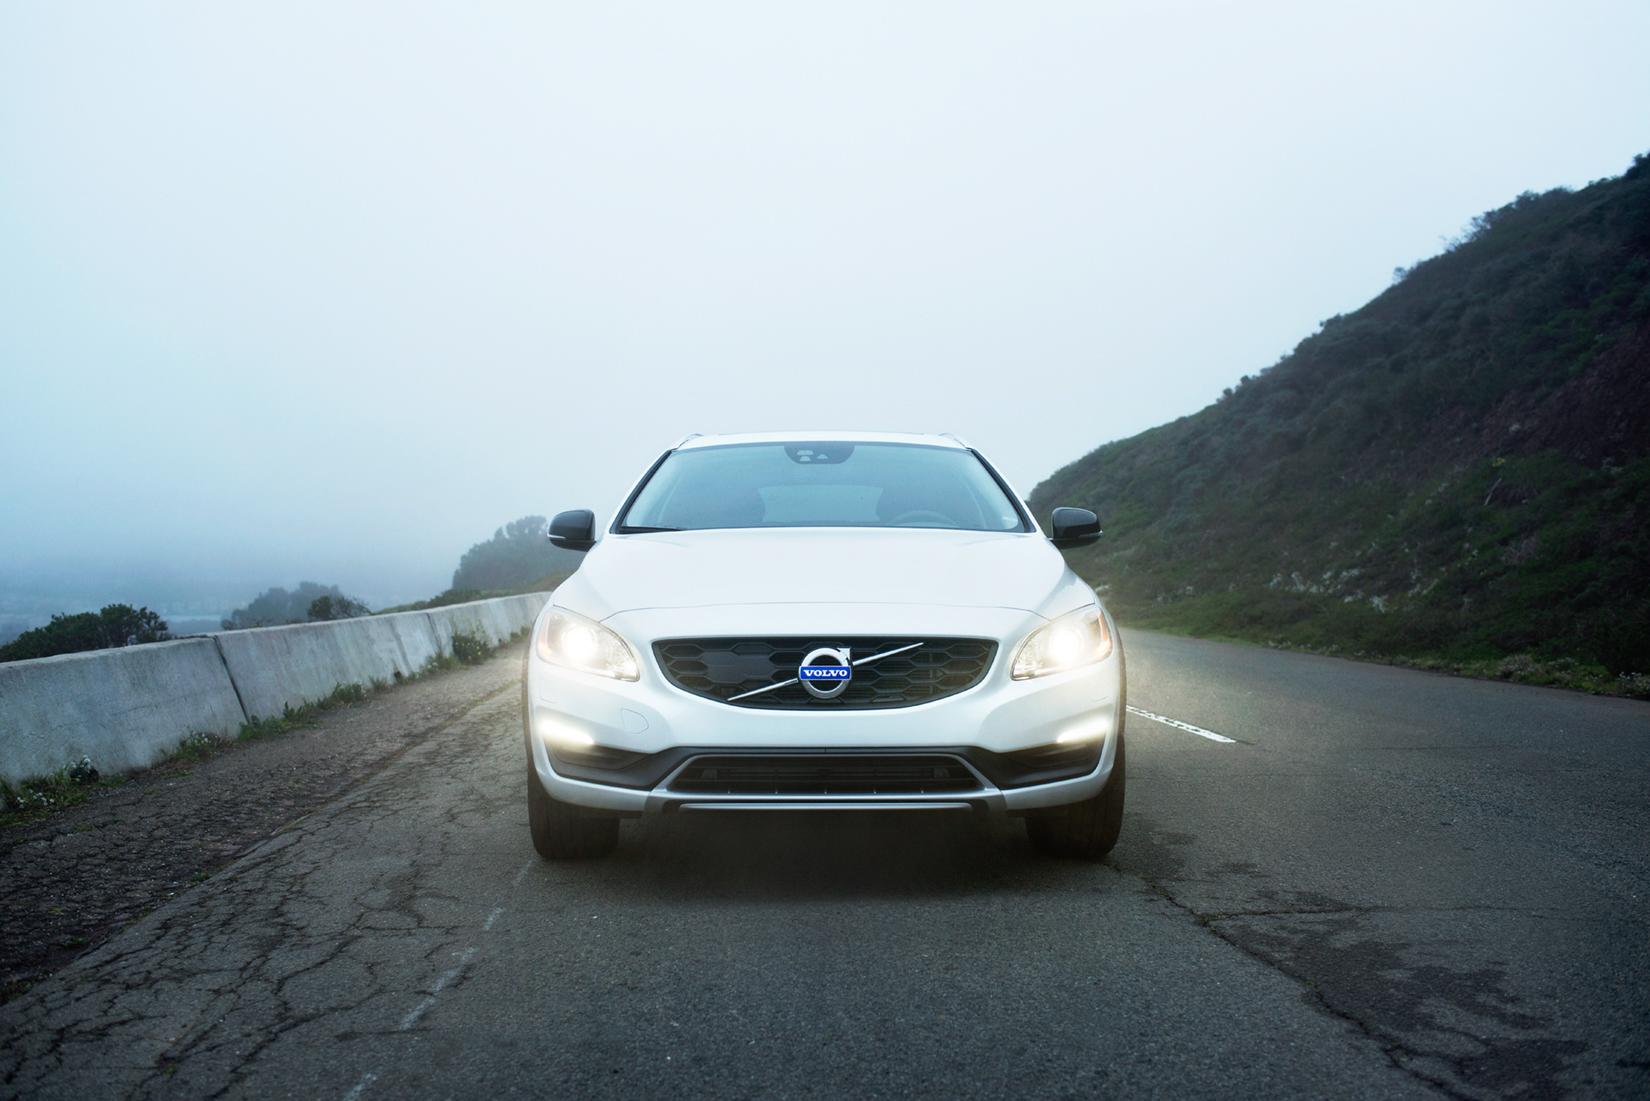 Volvo-SanFrancisco-0390.jpg